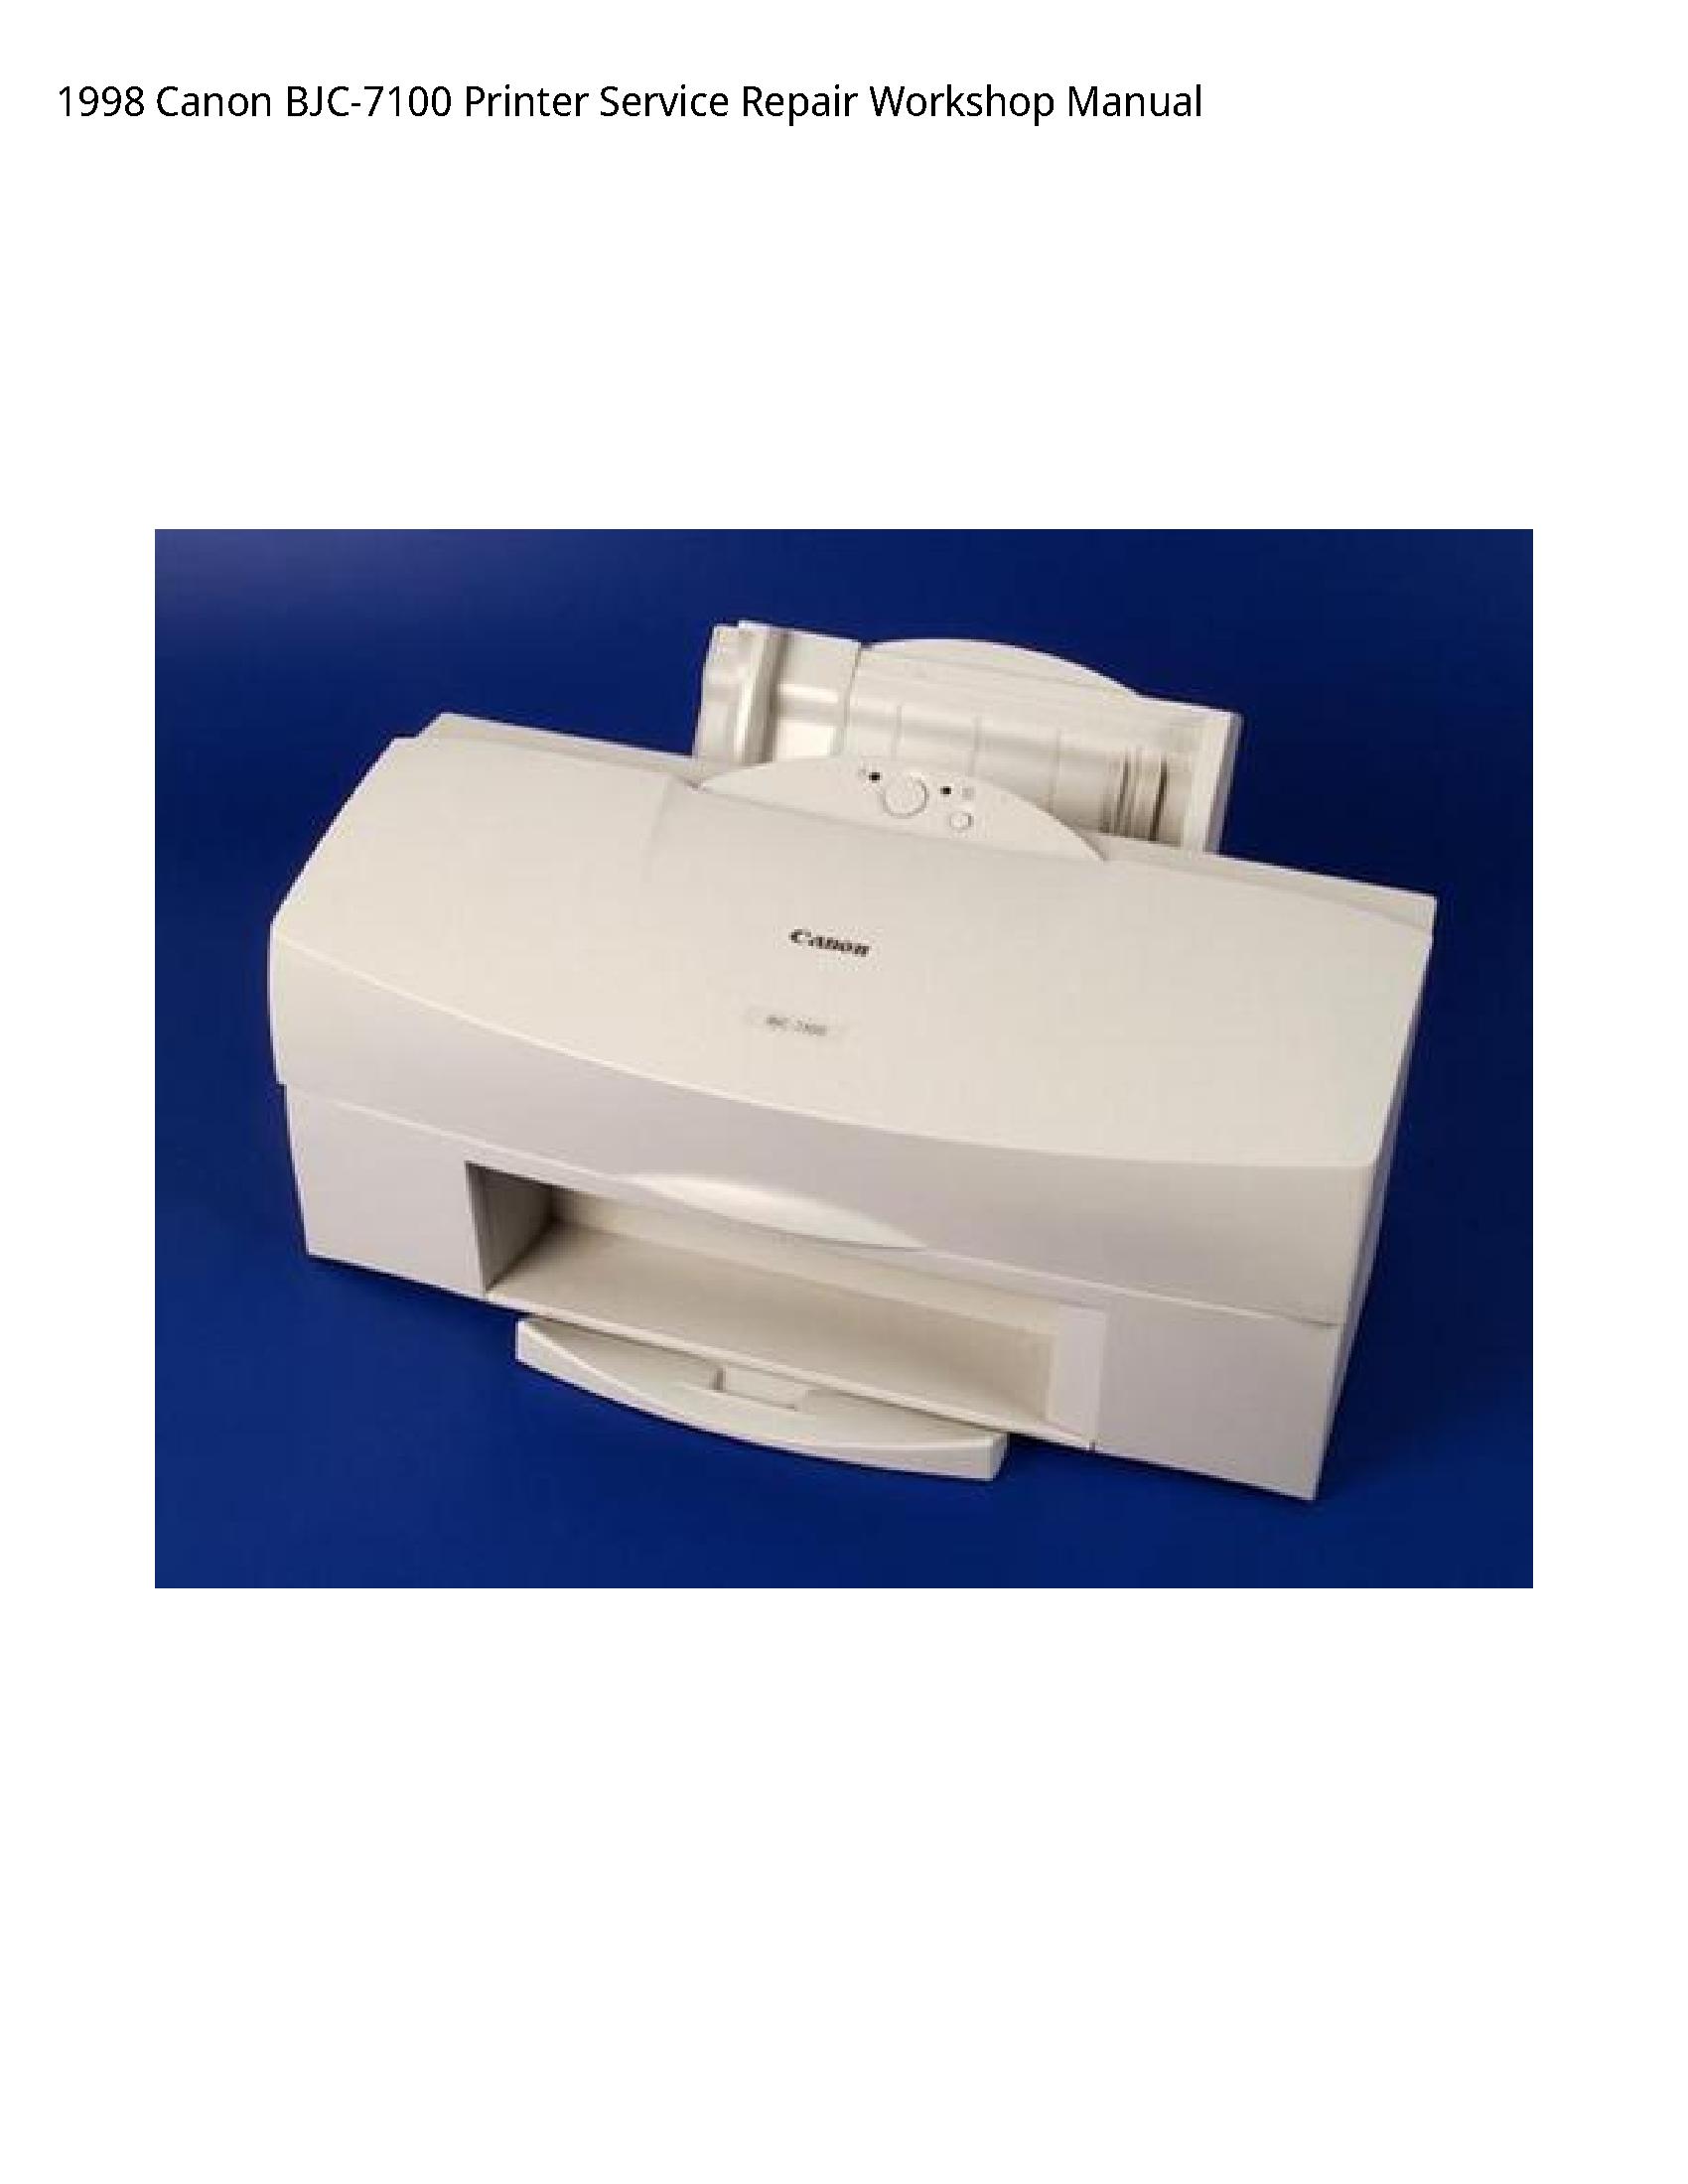 Canon BJC-7100 Printer manual